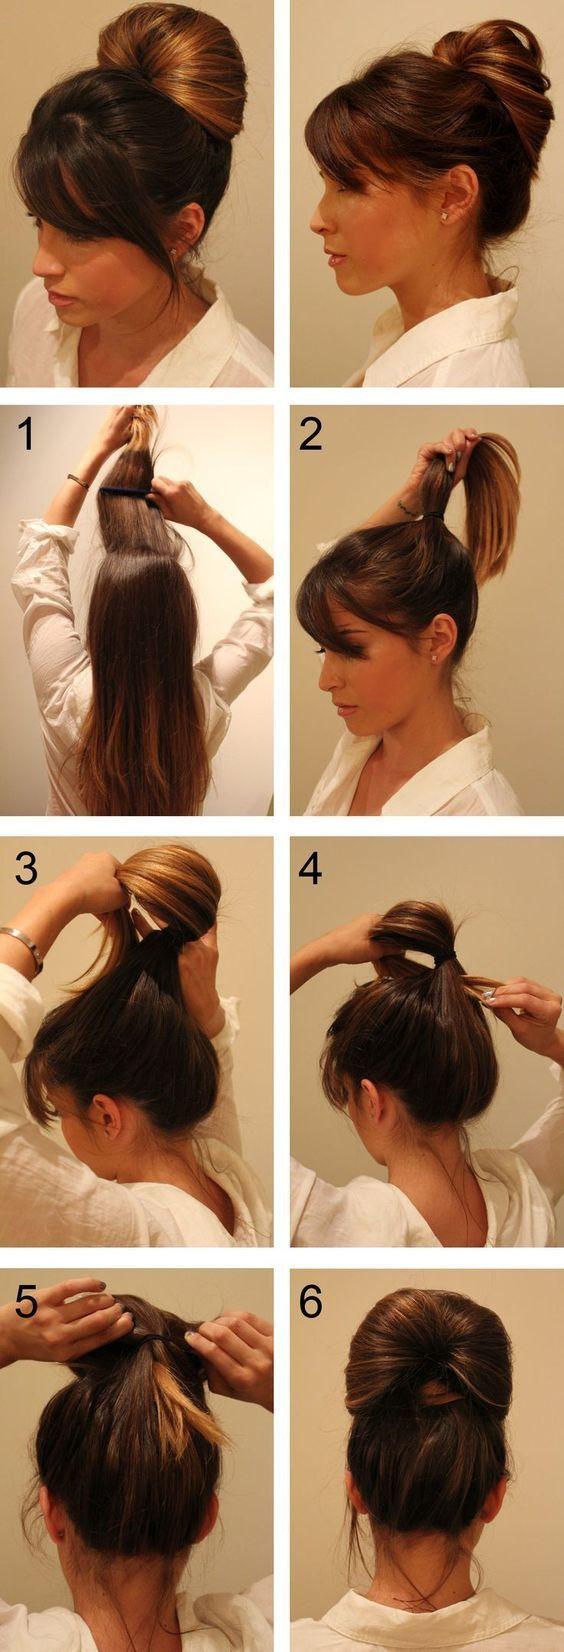 best hair picks images on pinterest short bobs hair cut and